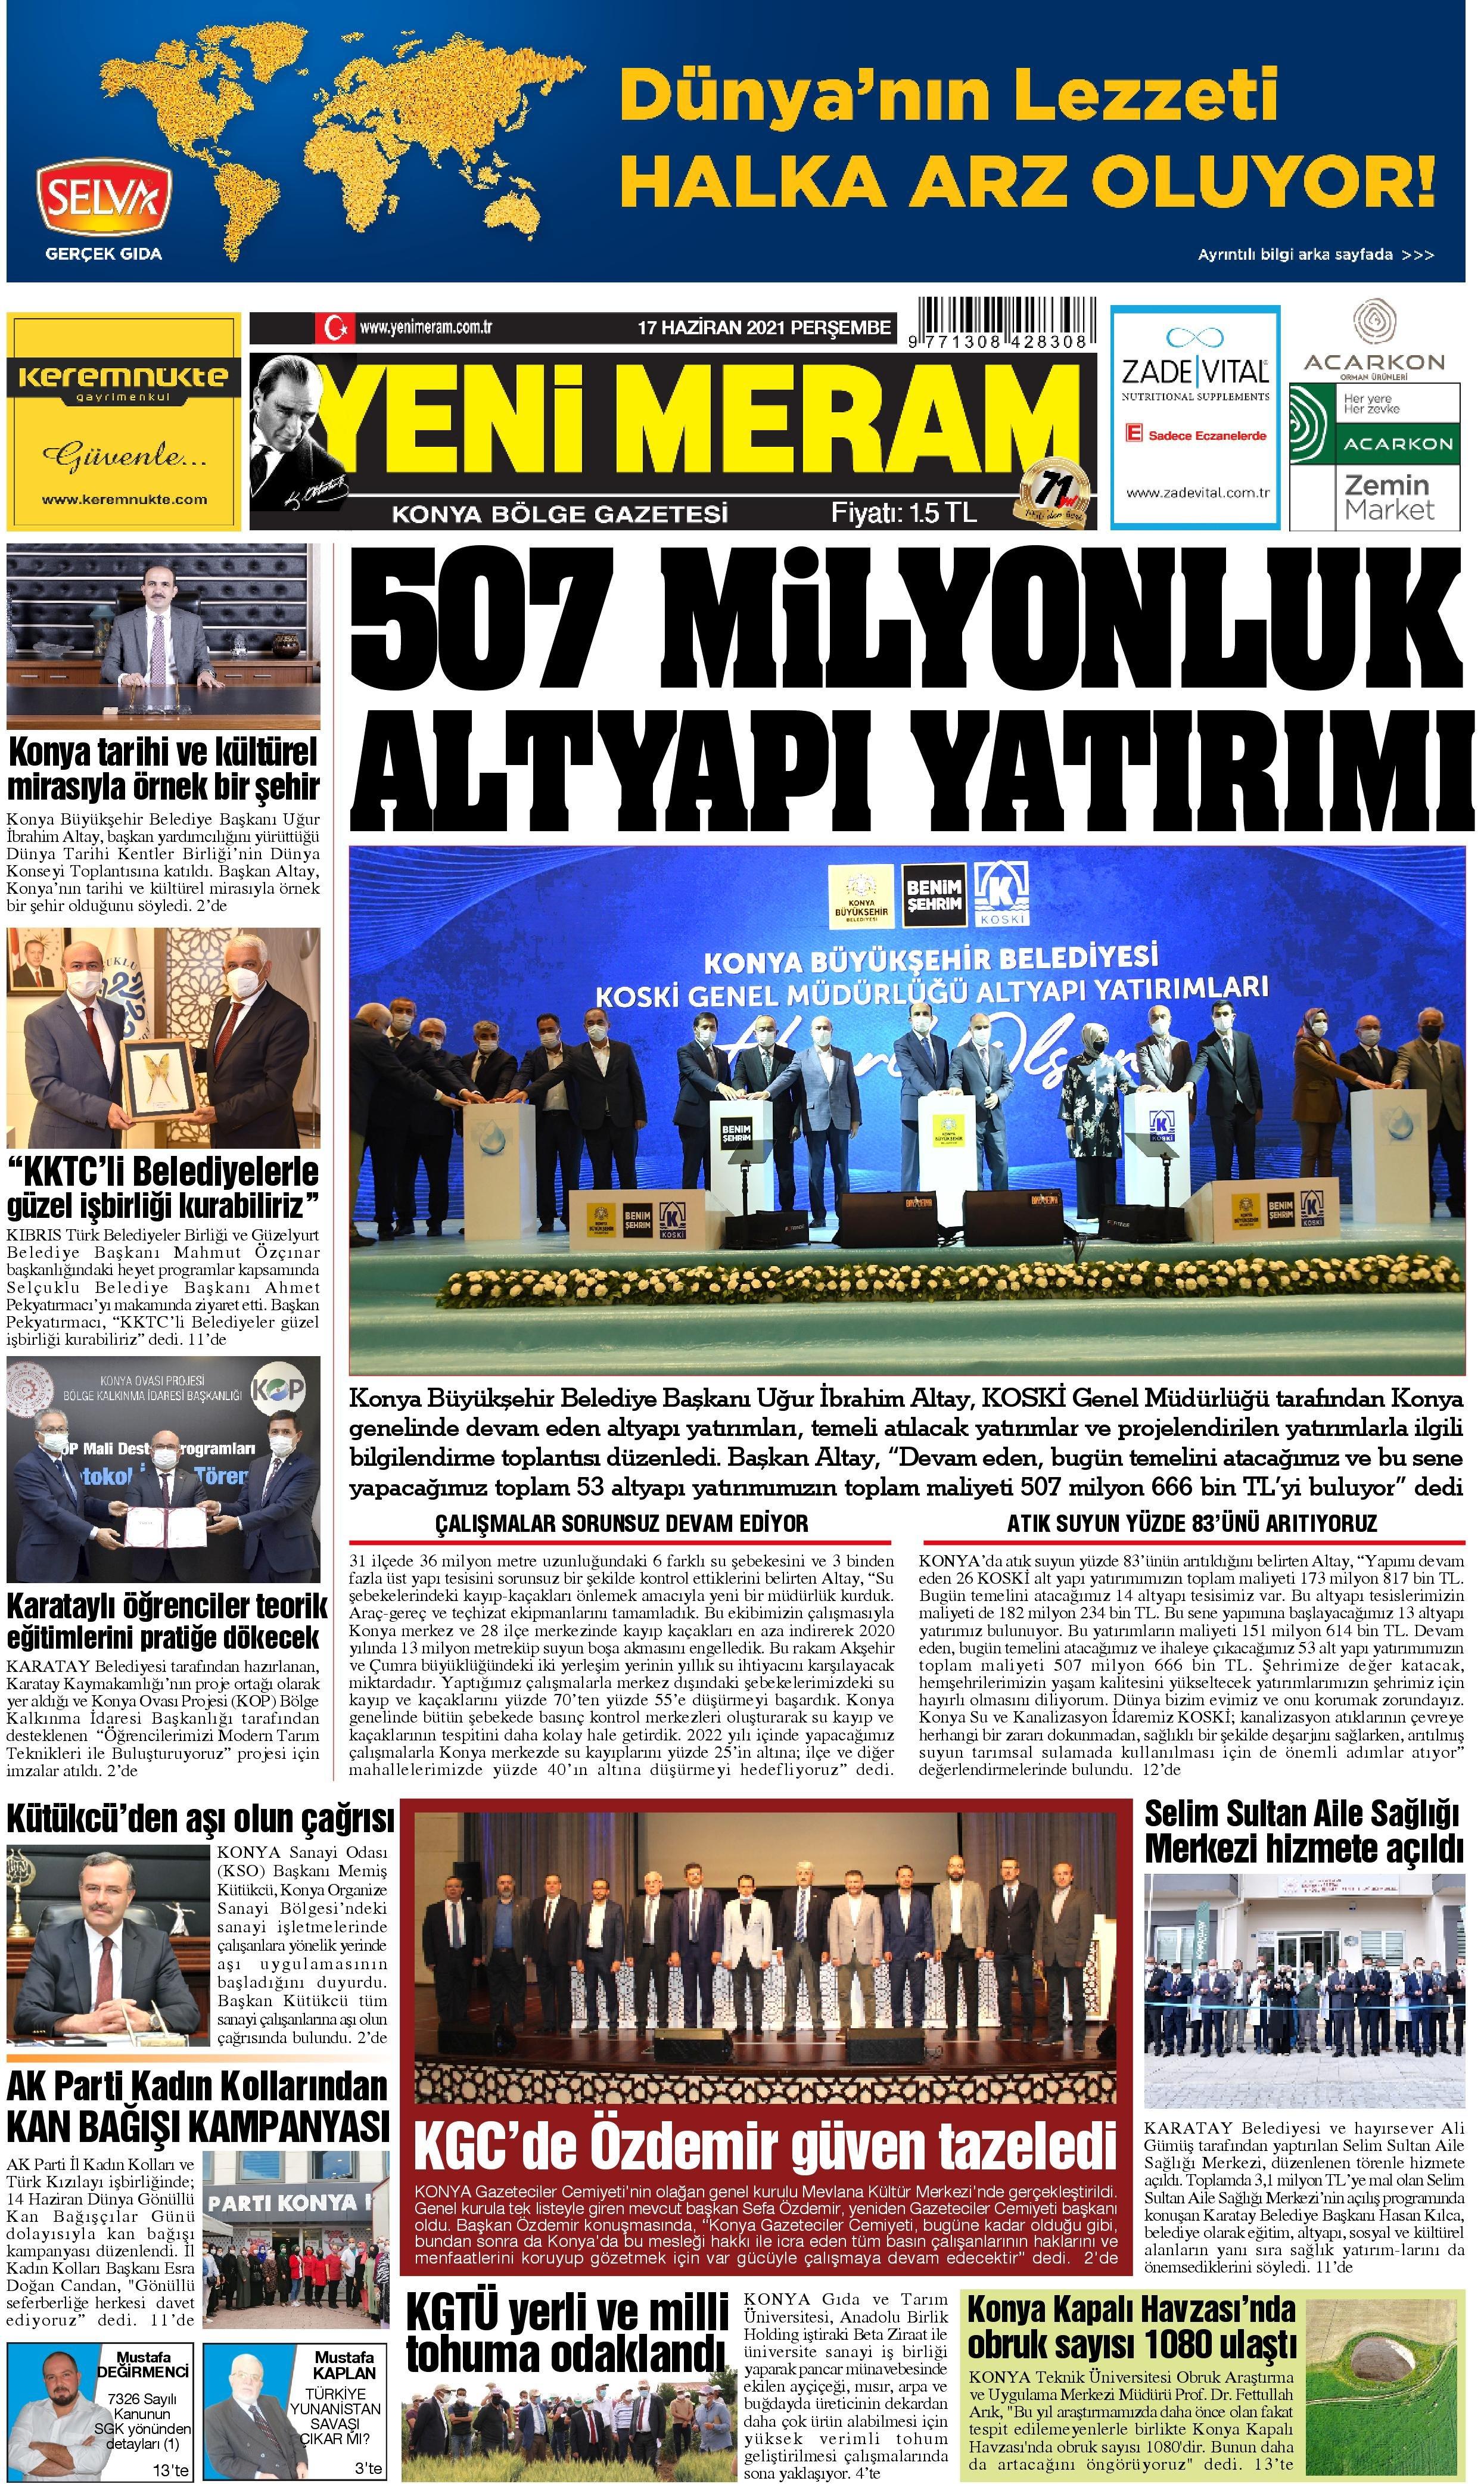 17 Haziran 2021 Yeni Meram Gazetesi